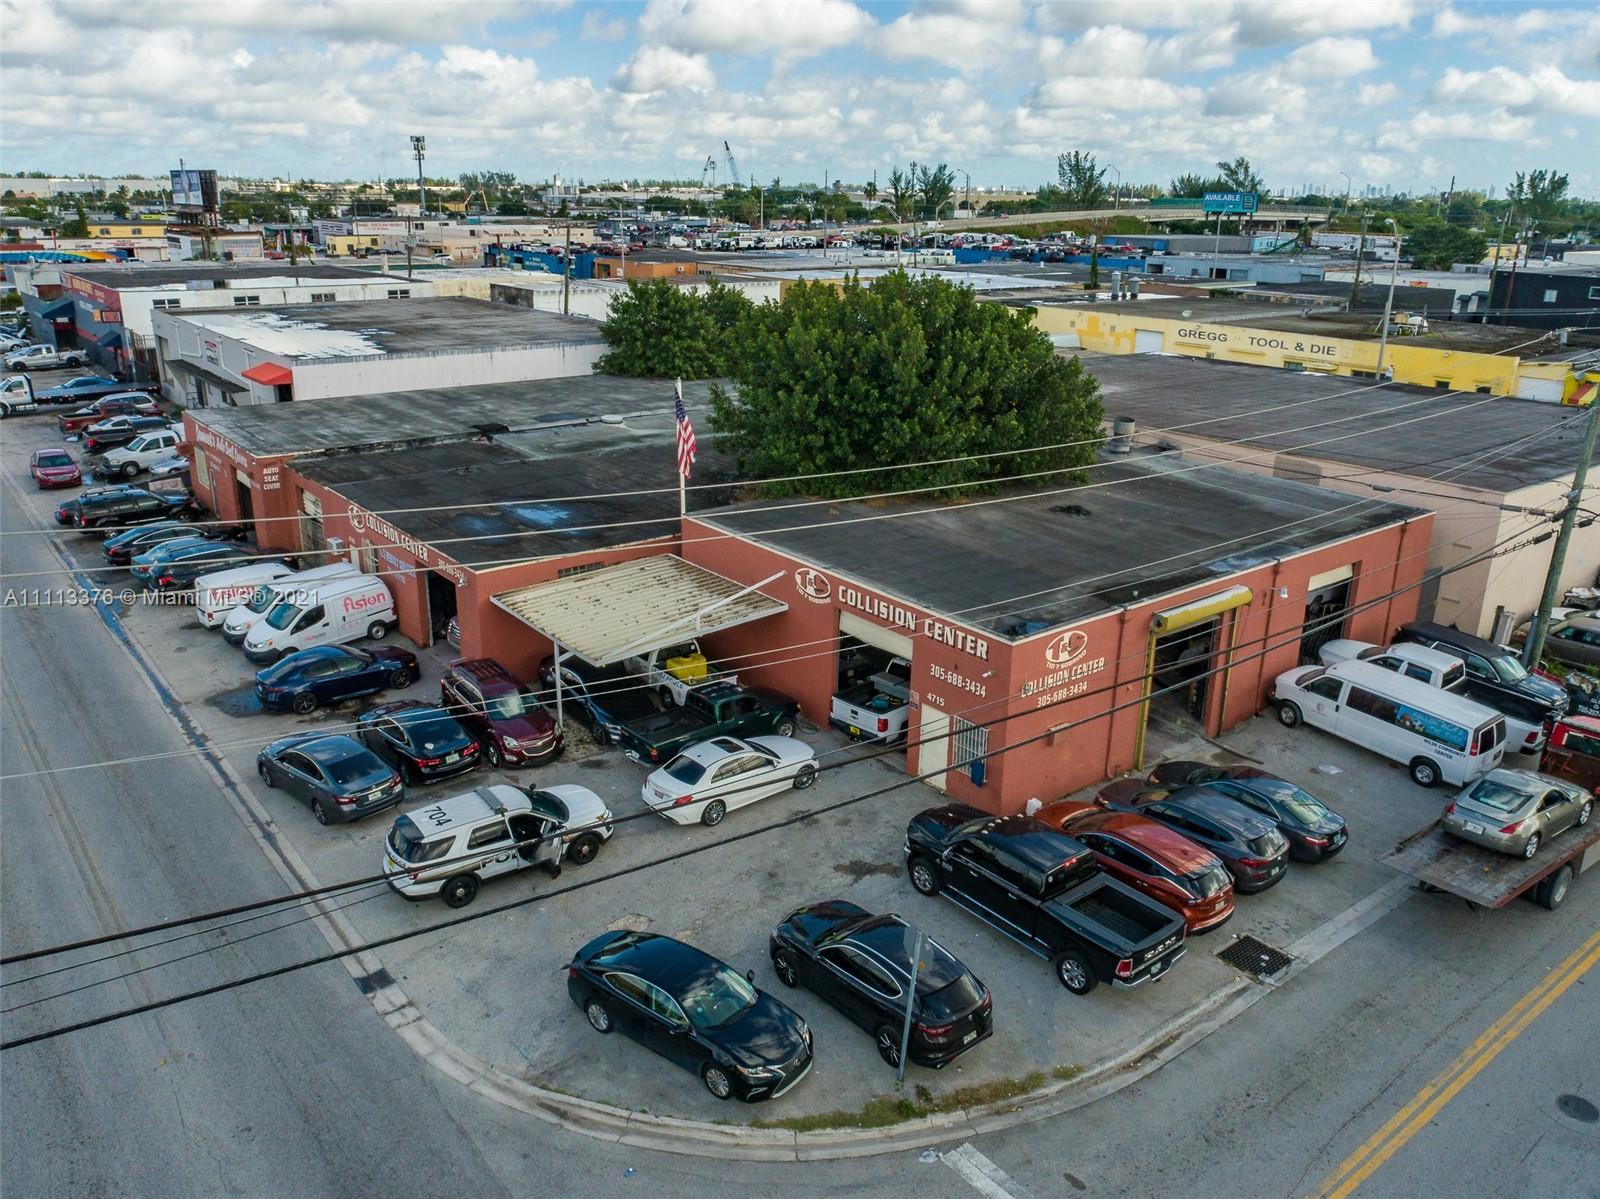 4715 E 10th Ave, Hialeah, FL 33013